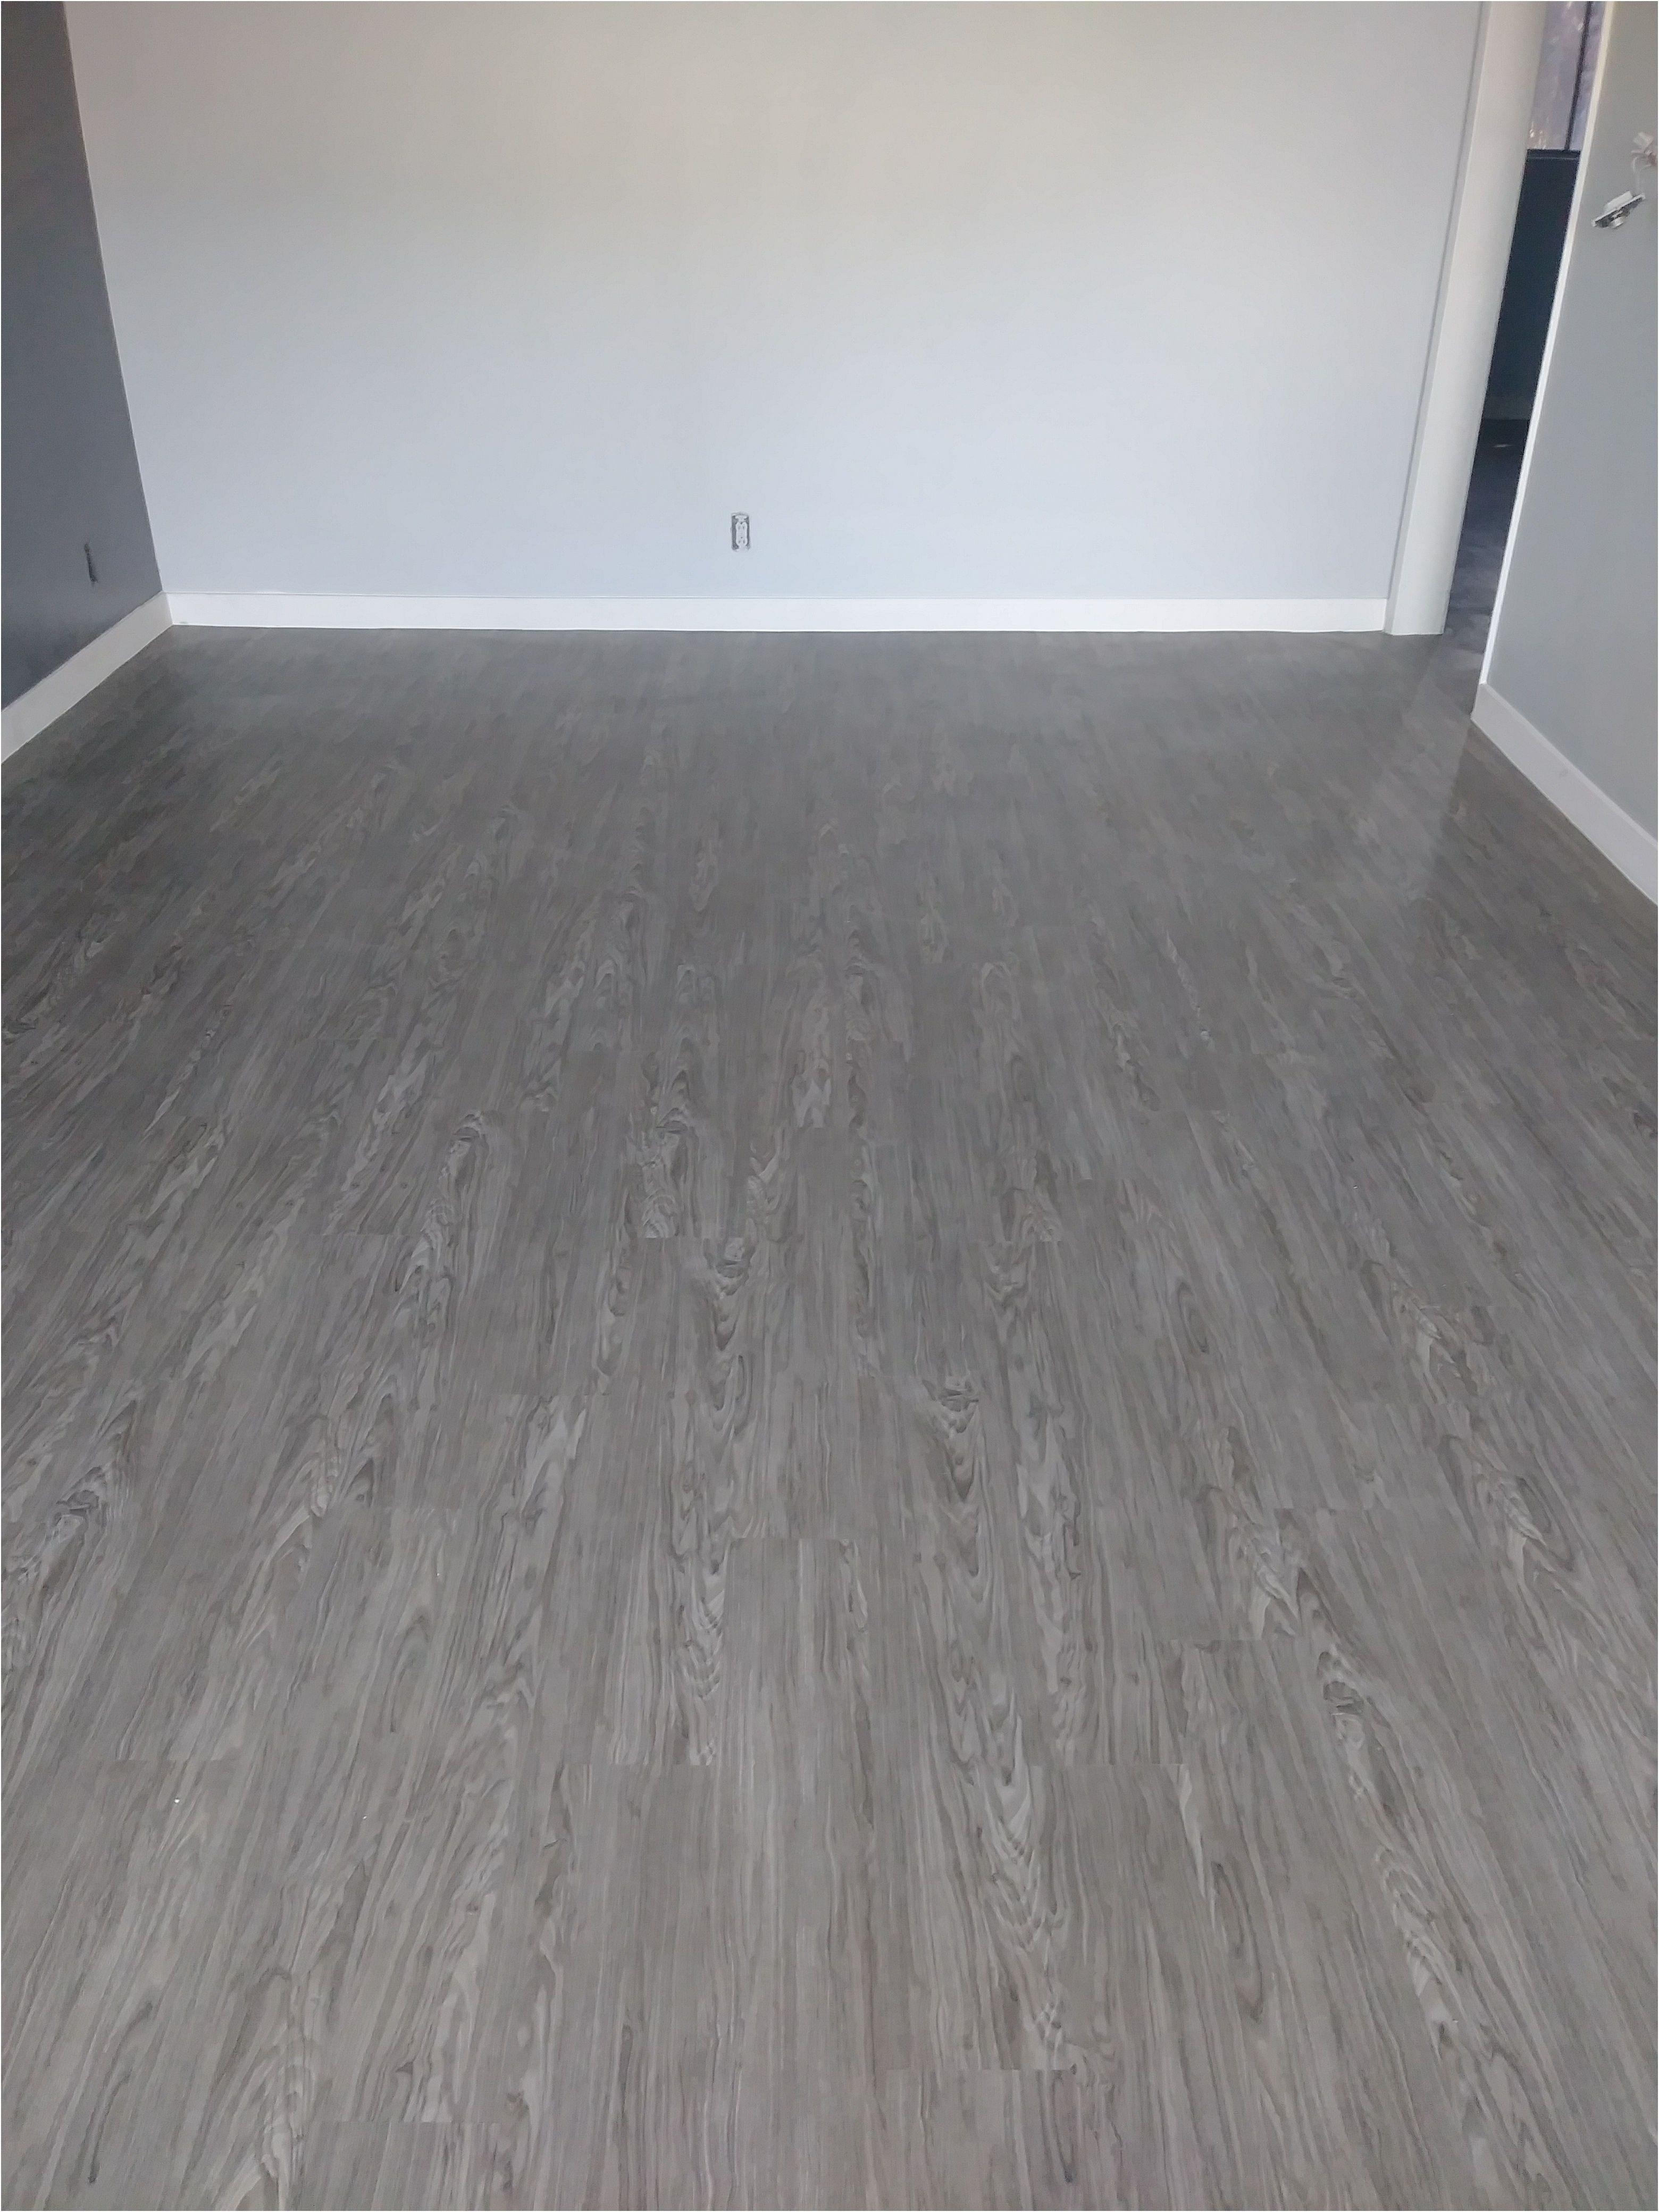 js hardwood flooring of flooring nj kronotex amazon harbour oak pinterest floor for flooring nj free in home flooring estimate collection 0d castlebay drive